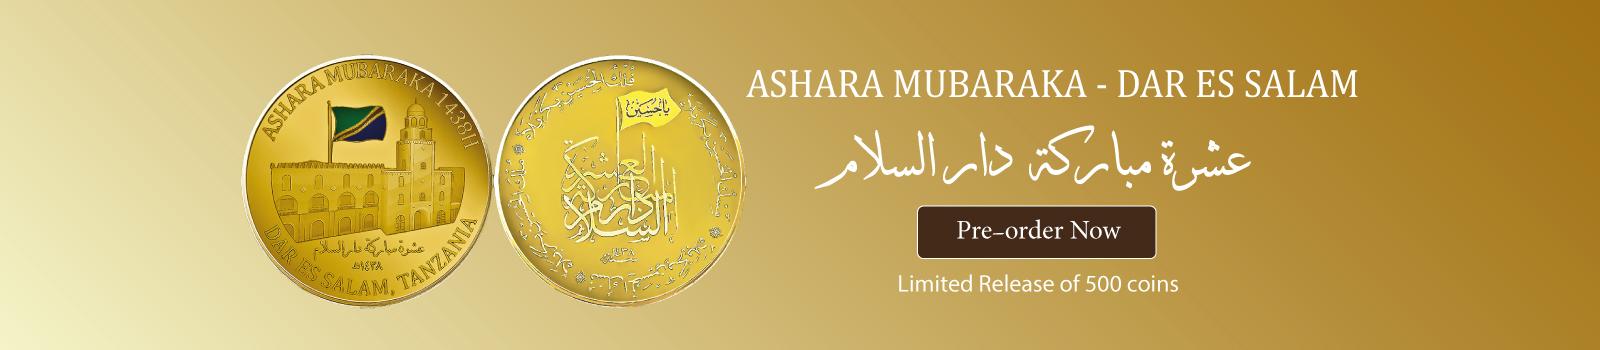 Ashara Mubaraka Dar Es Salam